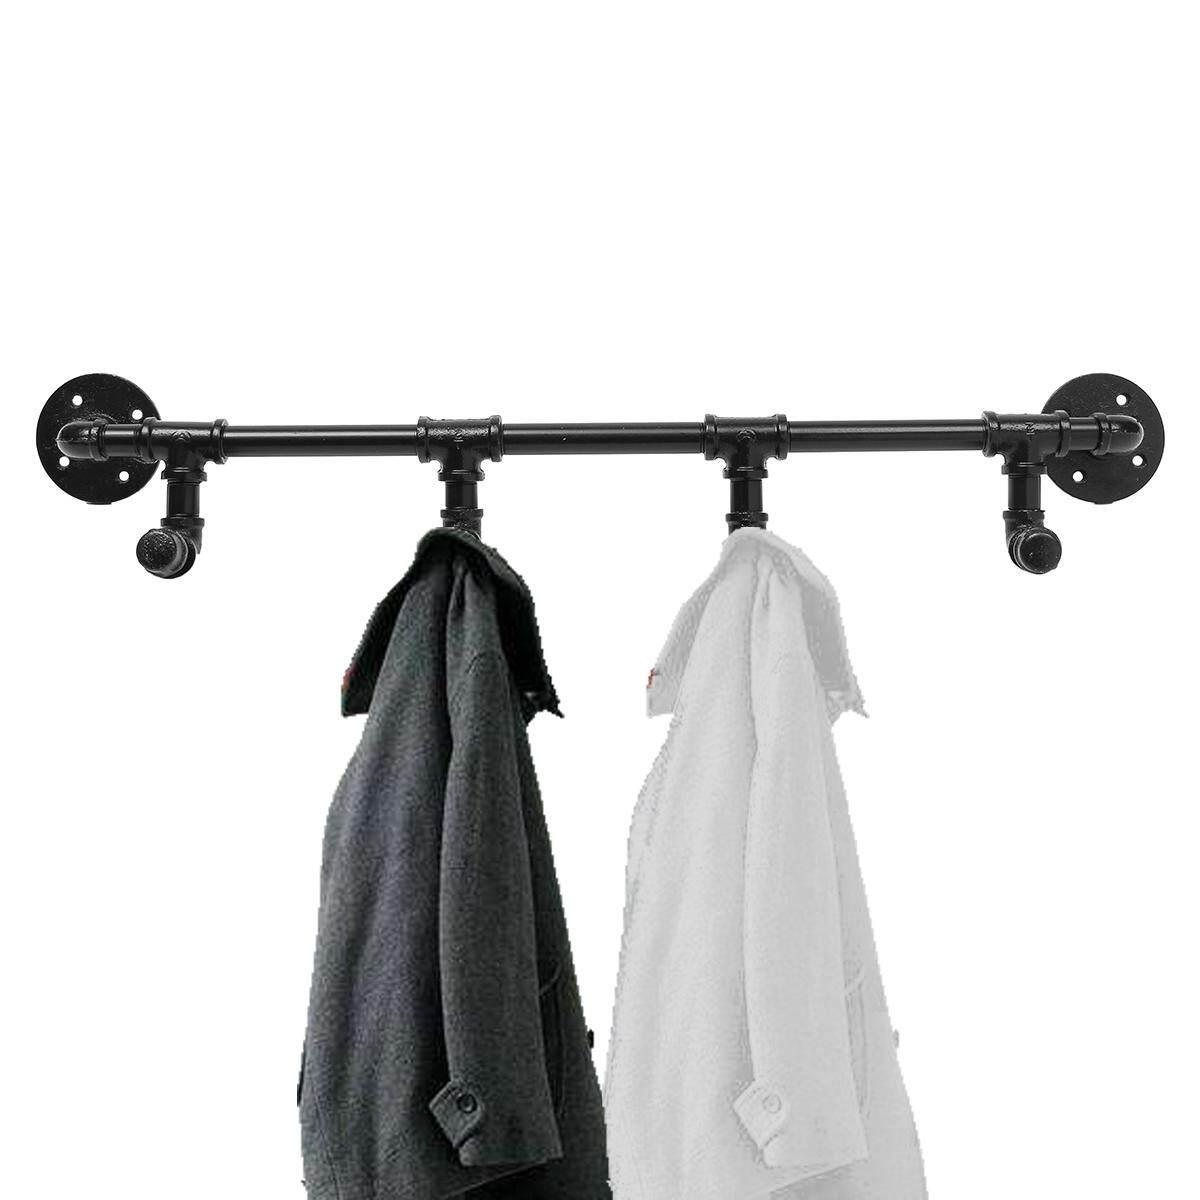 28 4 Hooks Wall Mounted Industrial Steampunk Iron Pipe Coat Rack Towel Hanger